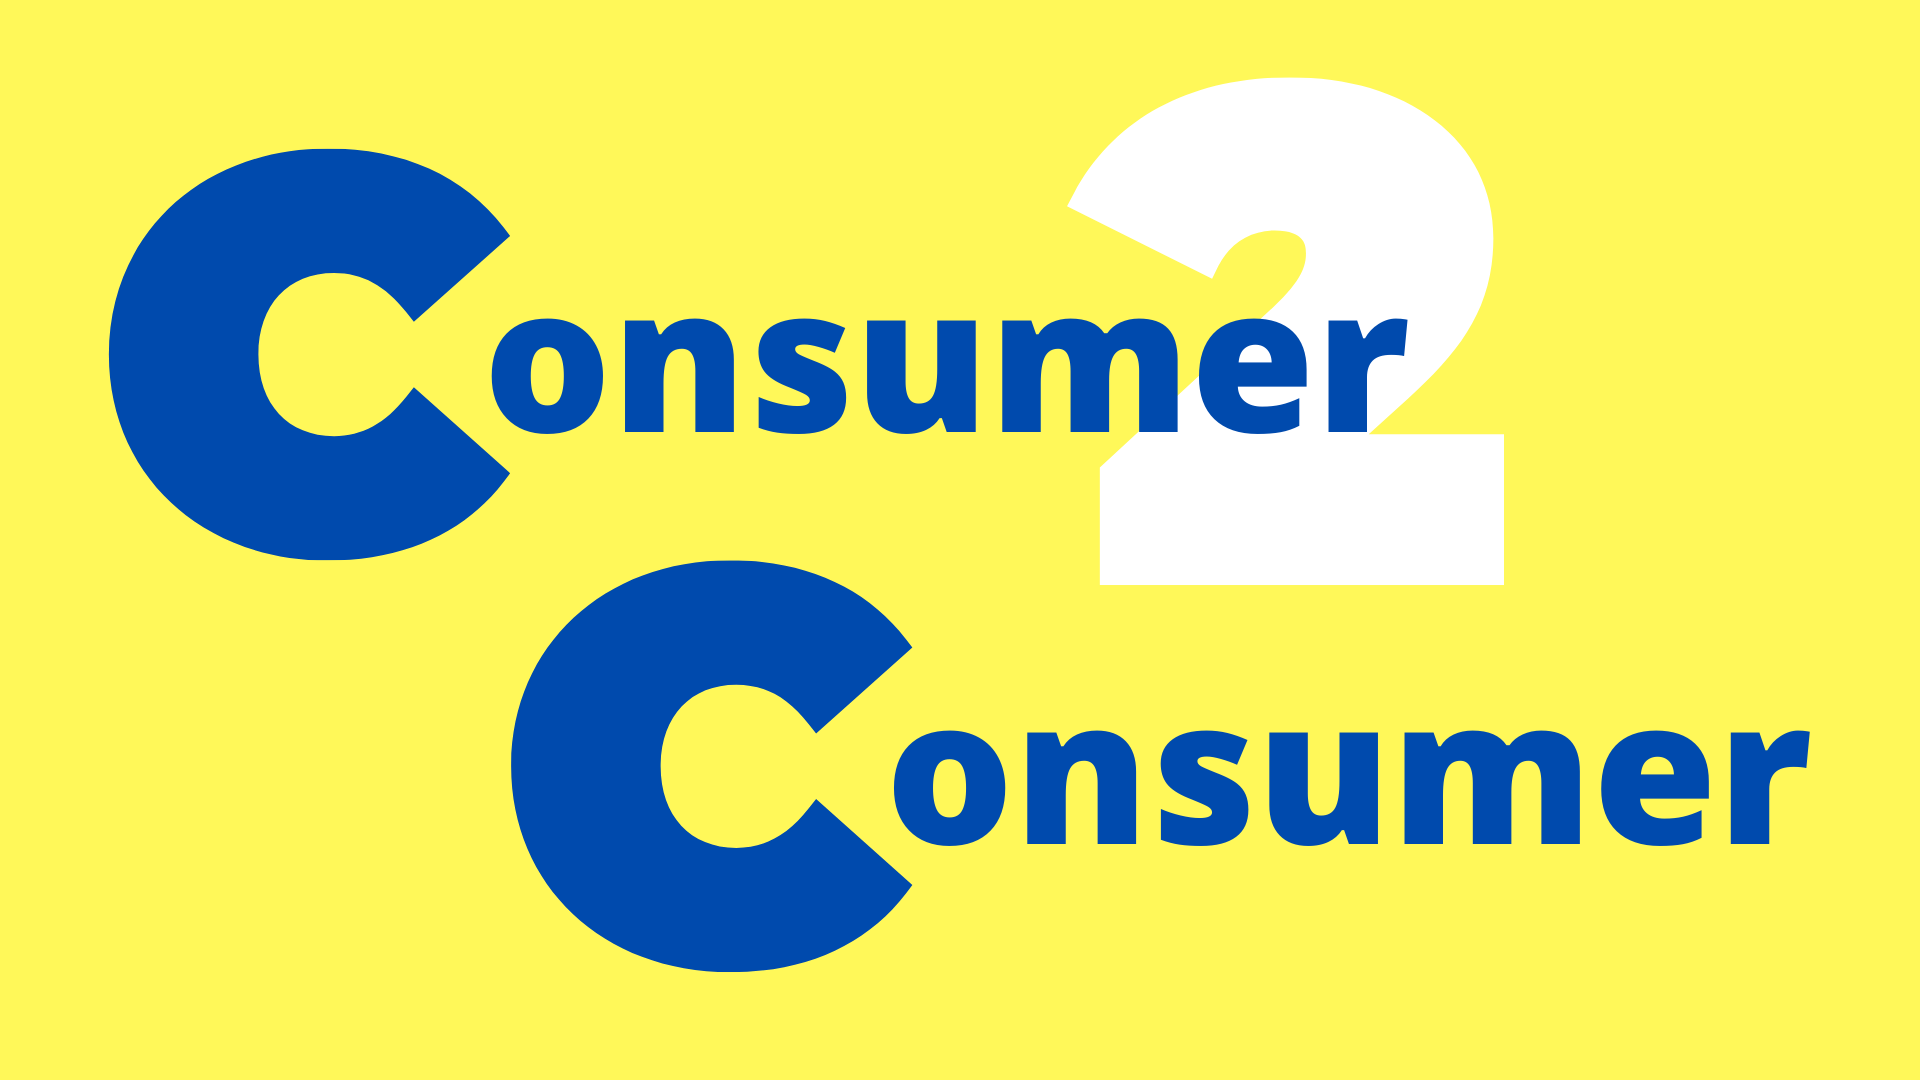 eCommerce consumer to consumer